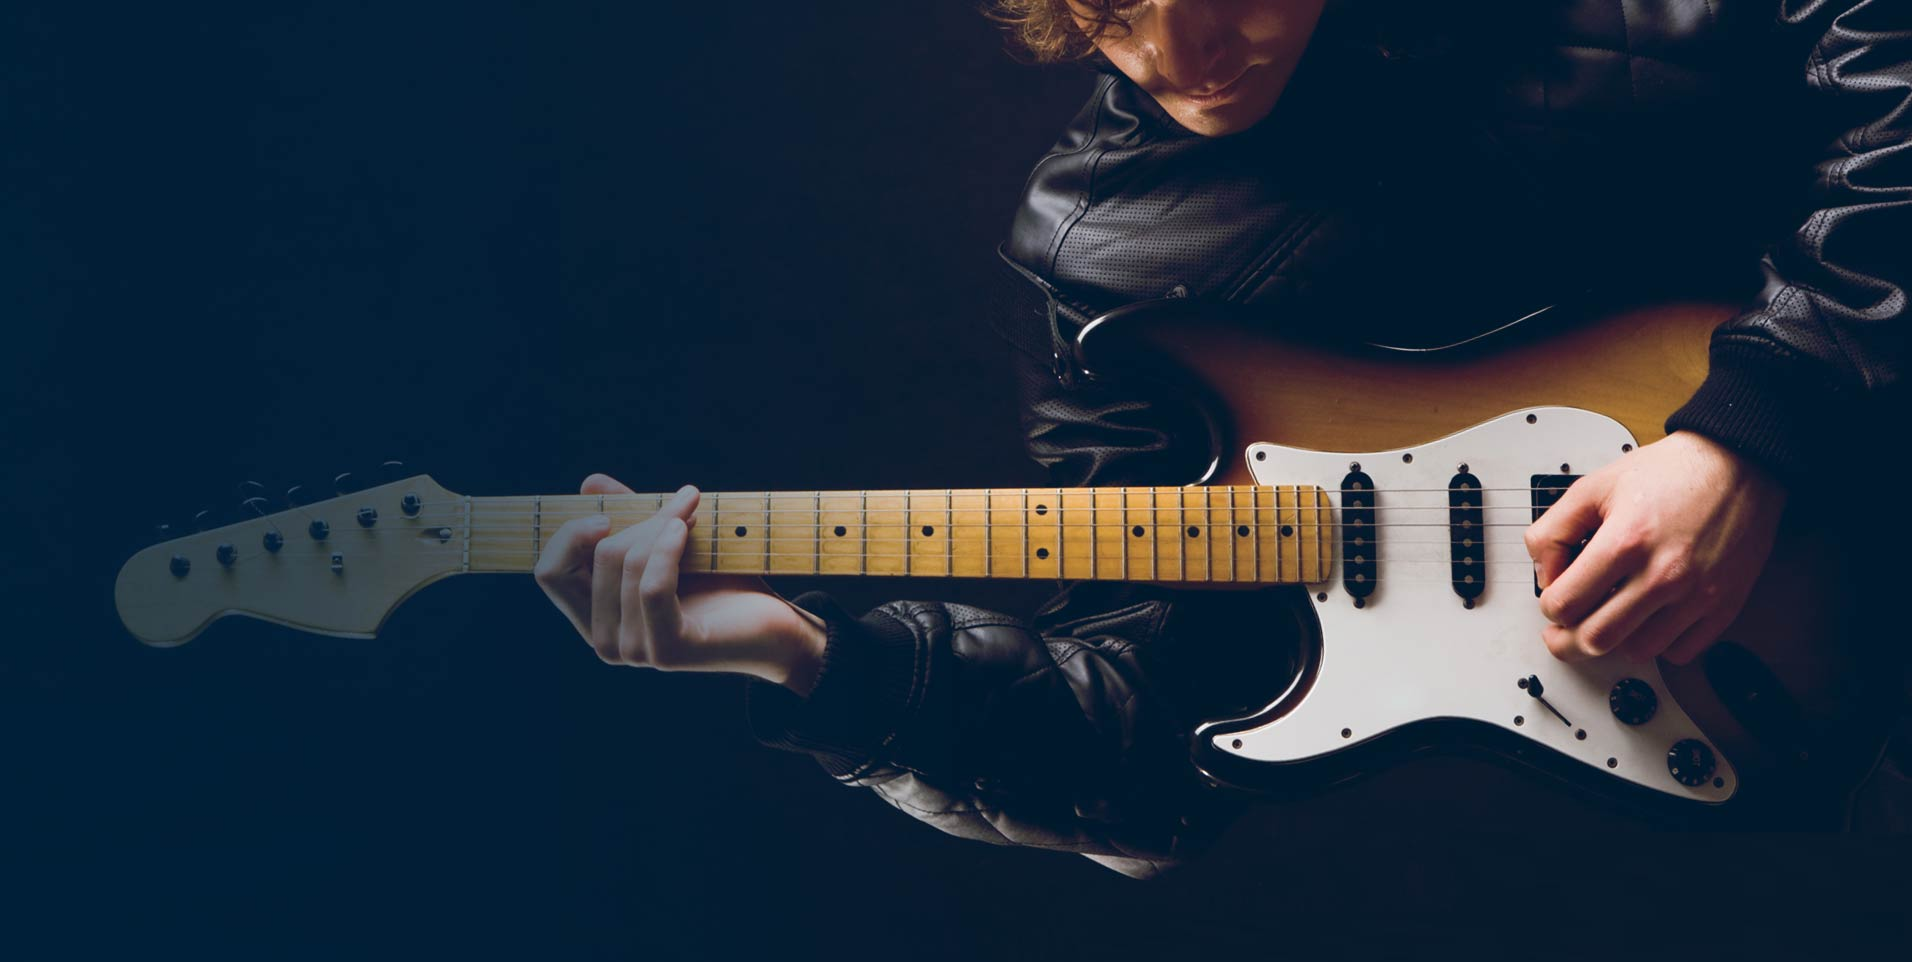 Startslider-Guitar-1